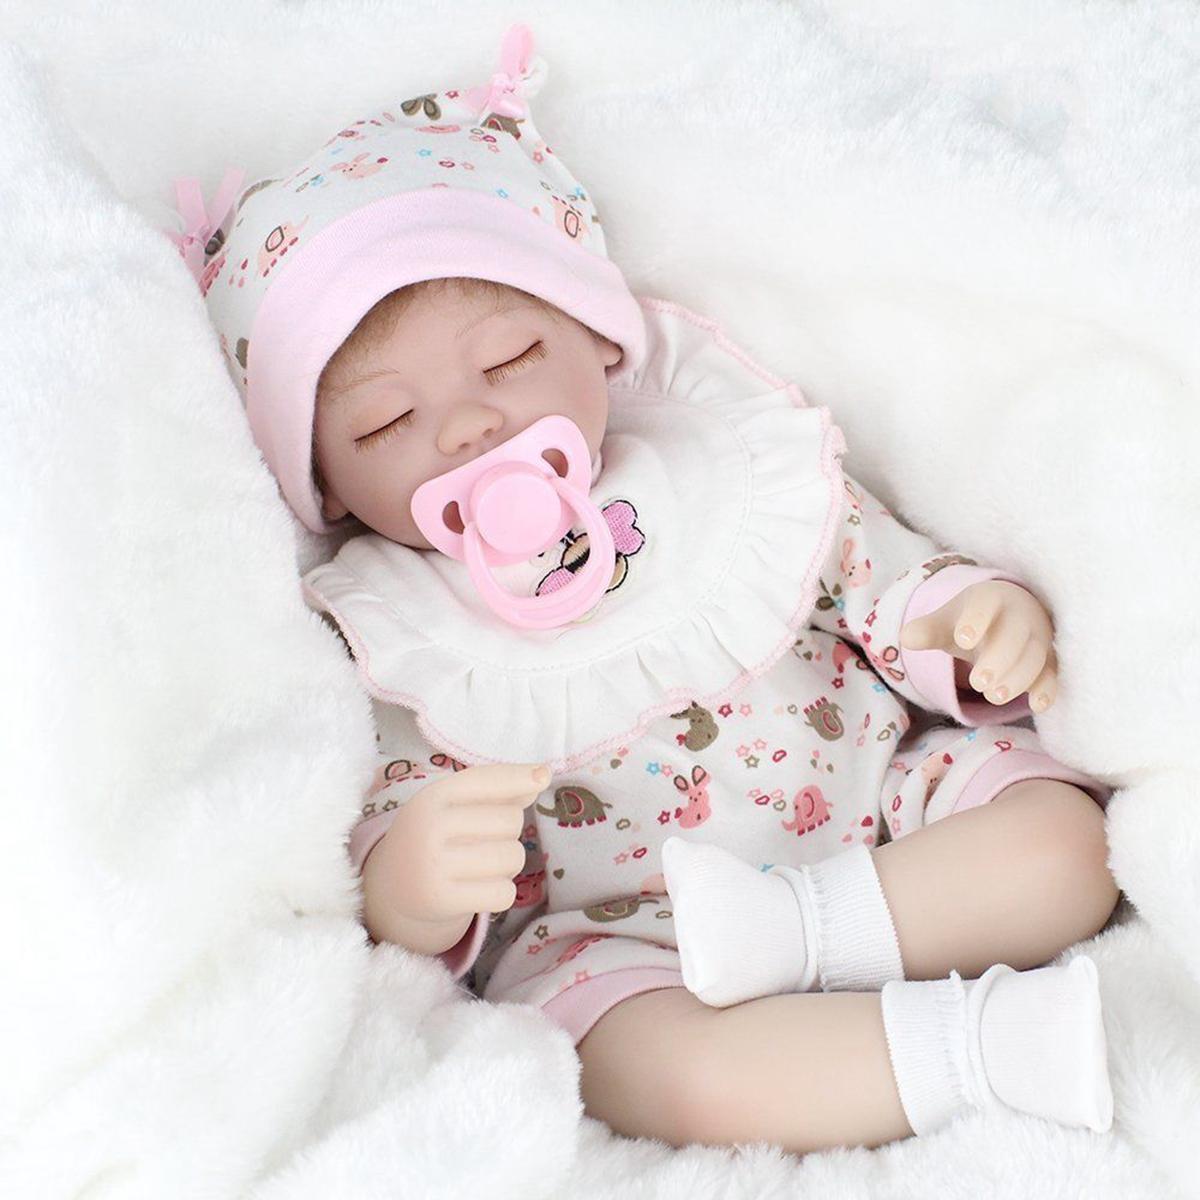 NPK 16 Inch 41cm Reborn Baby Realistic Soft Silicone Doll Handmade Lifelike Baby Girl Dolls Play House Toys Birthday Gift